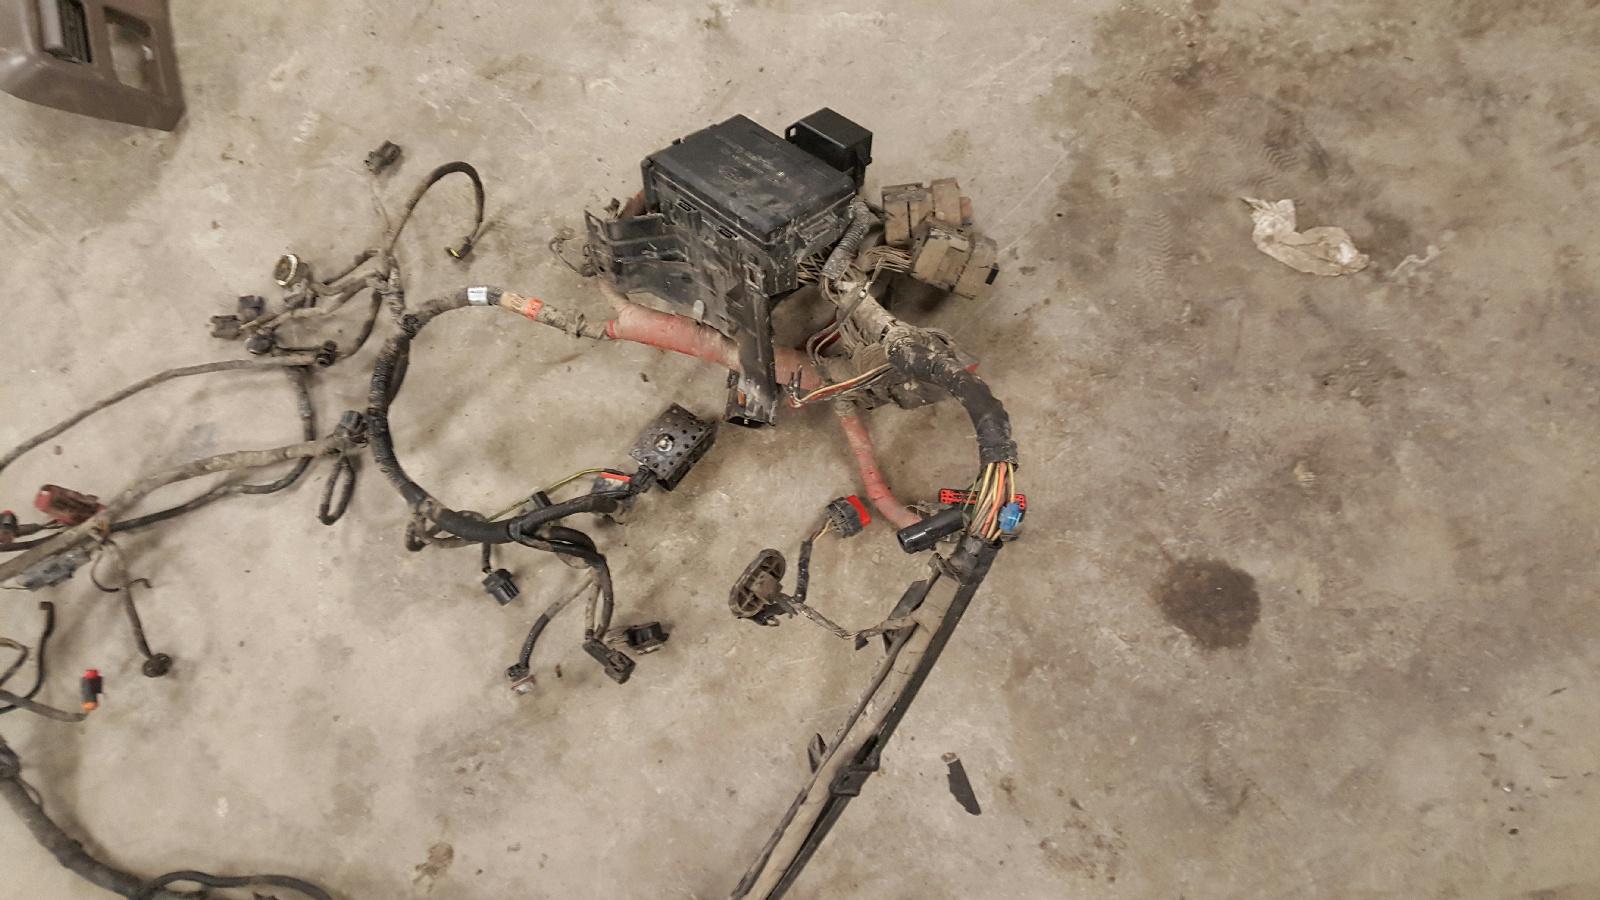 f350 1999 7 3 wiring harness 2003 f250 7 3 wiring harness